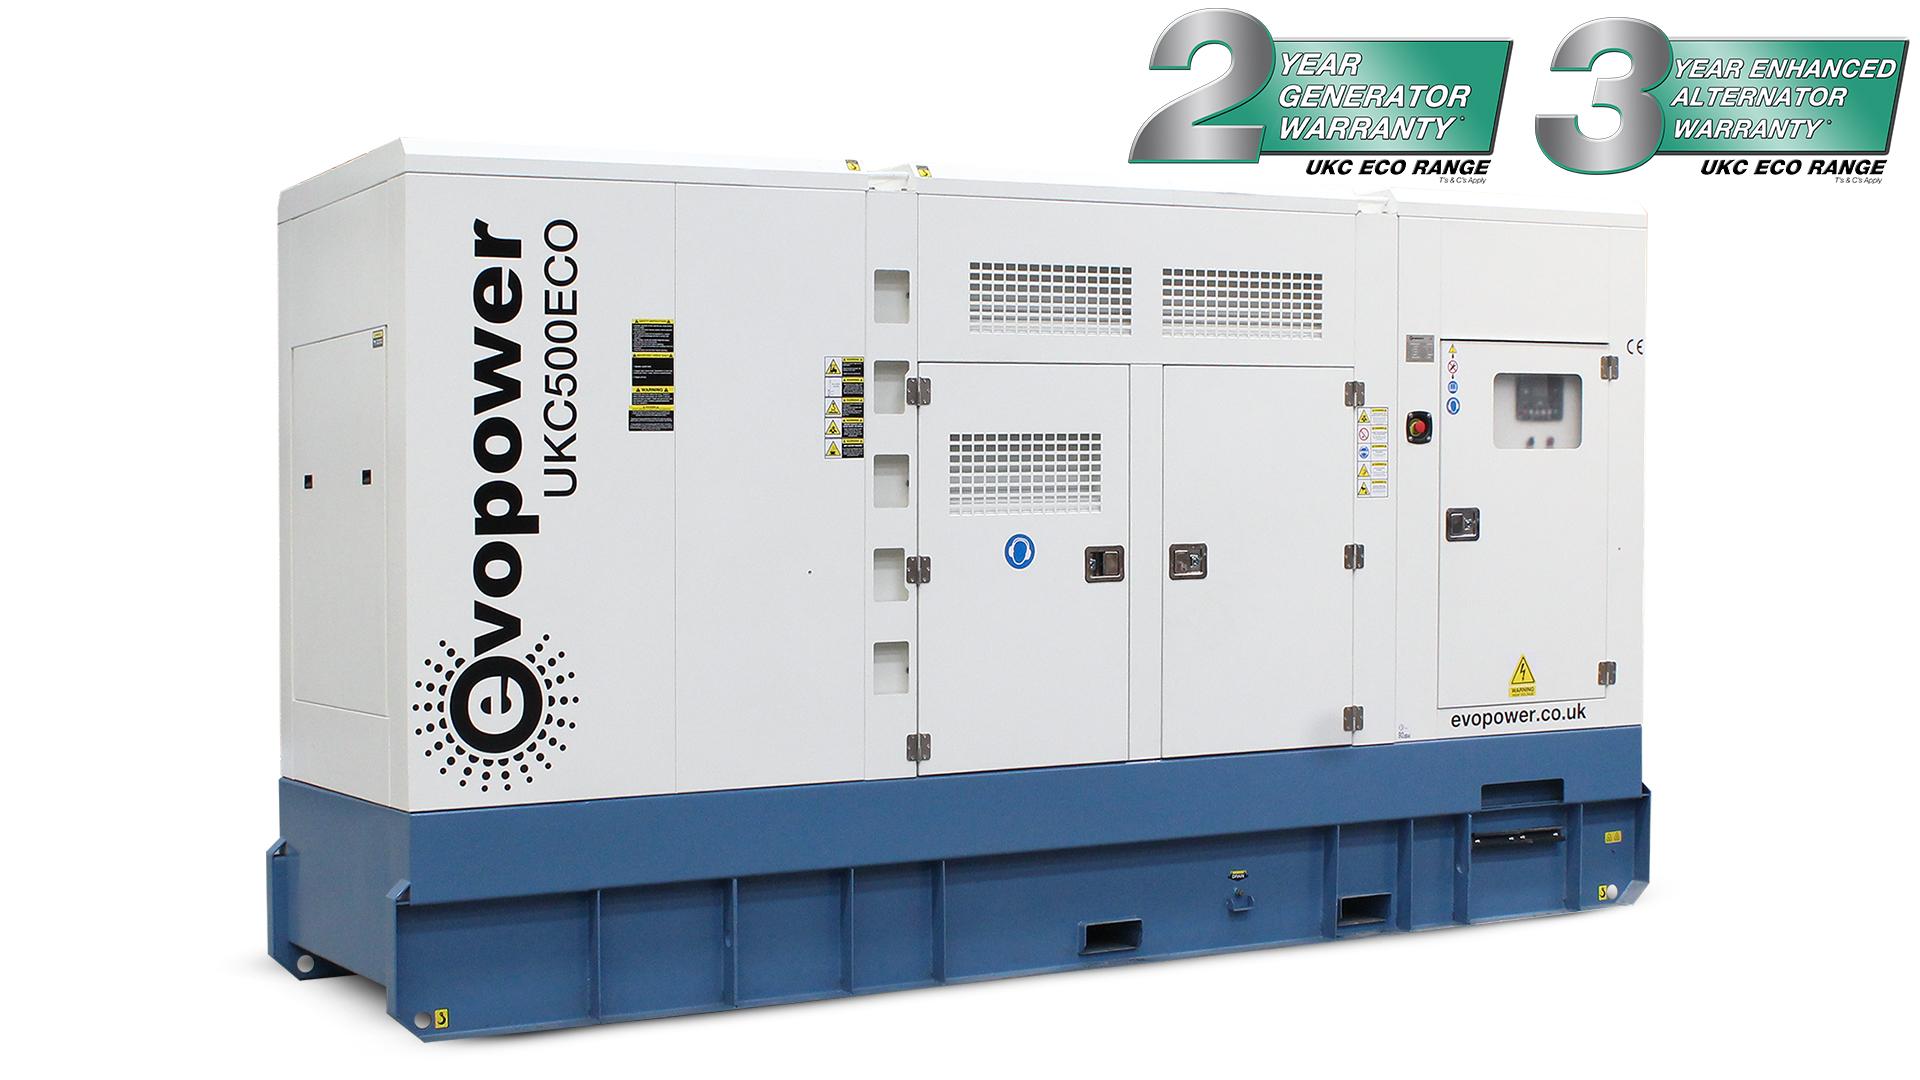 UKC500ECO 500kVA Diesel Generator Main Image